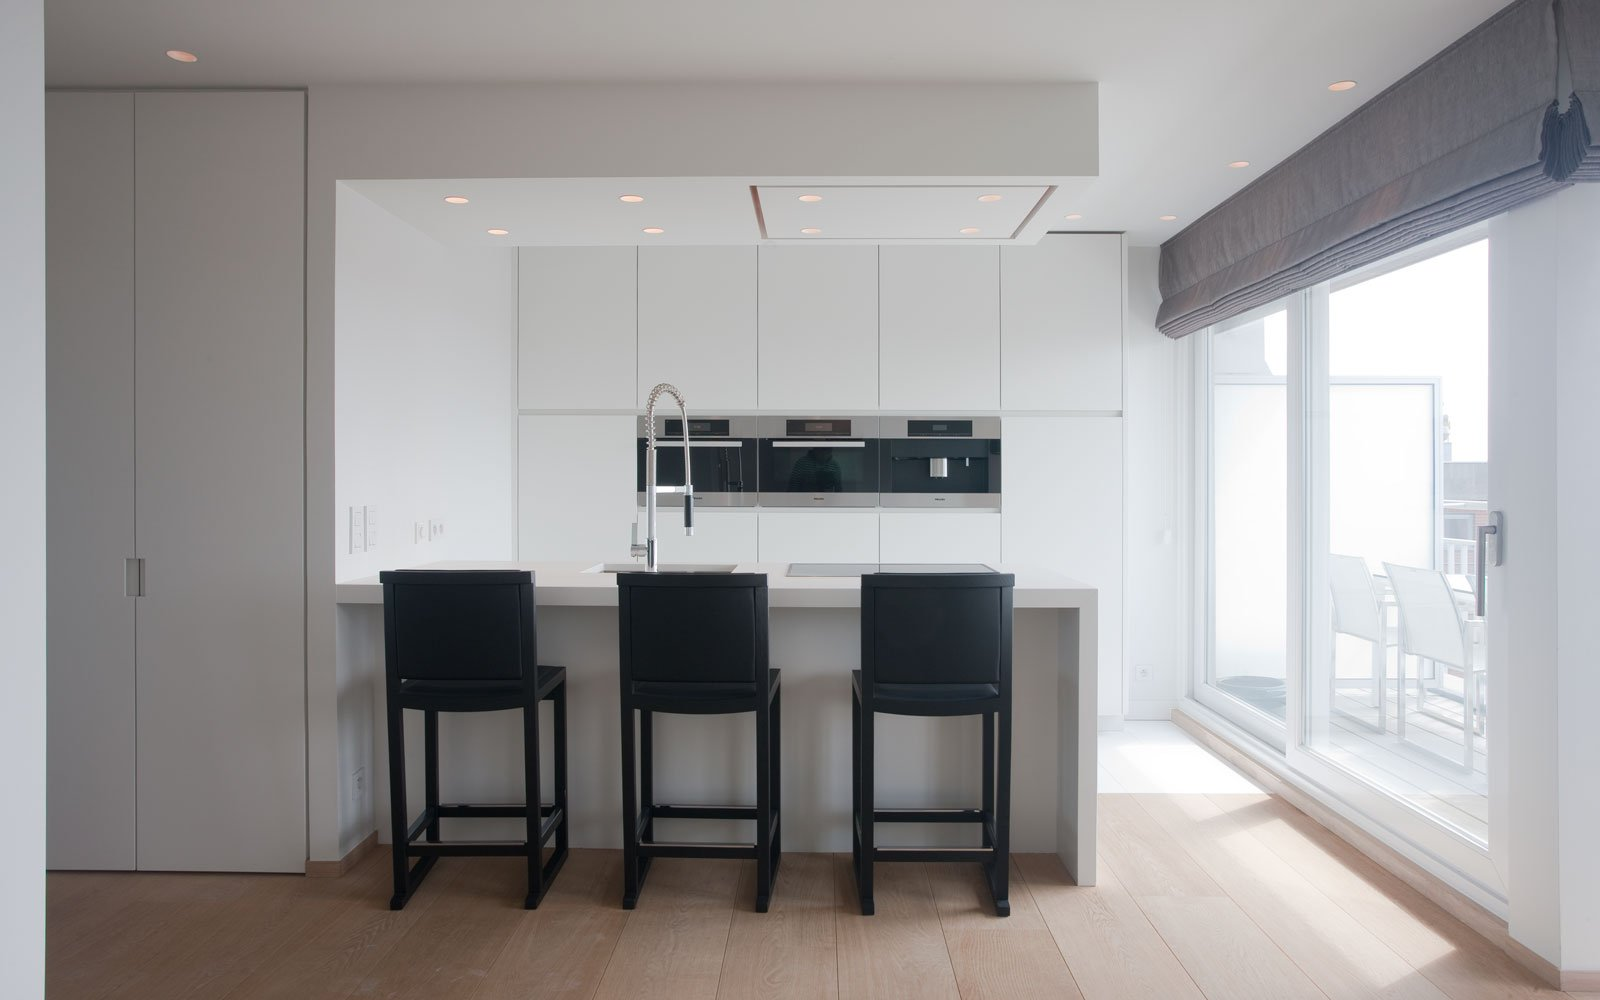 Keuken, strak, wit, kookeiland, krukjes, zwart, uitzicht, droomappartement, Stephan Gunst